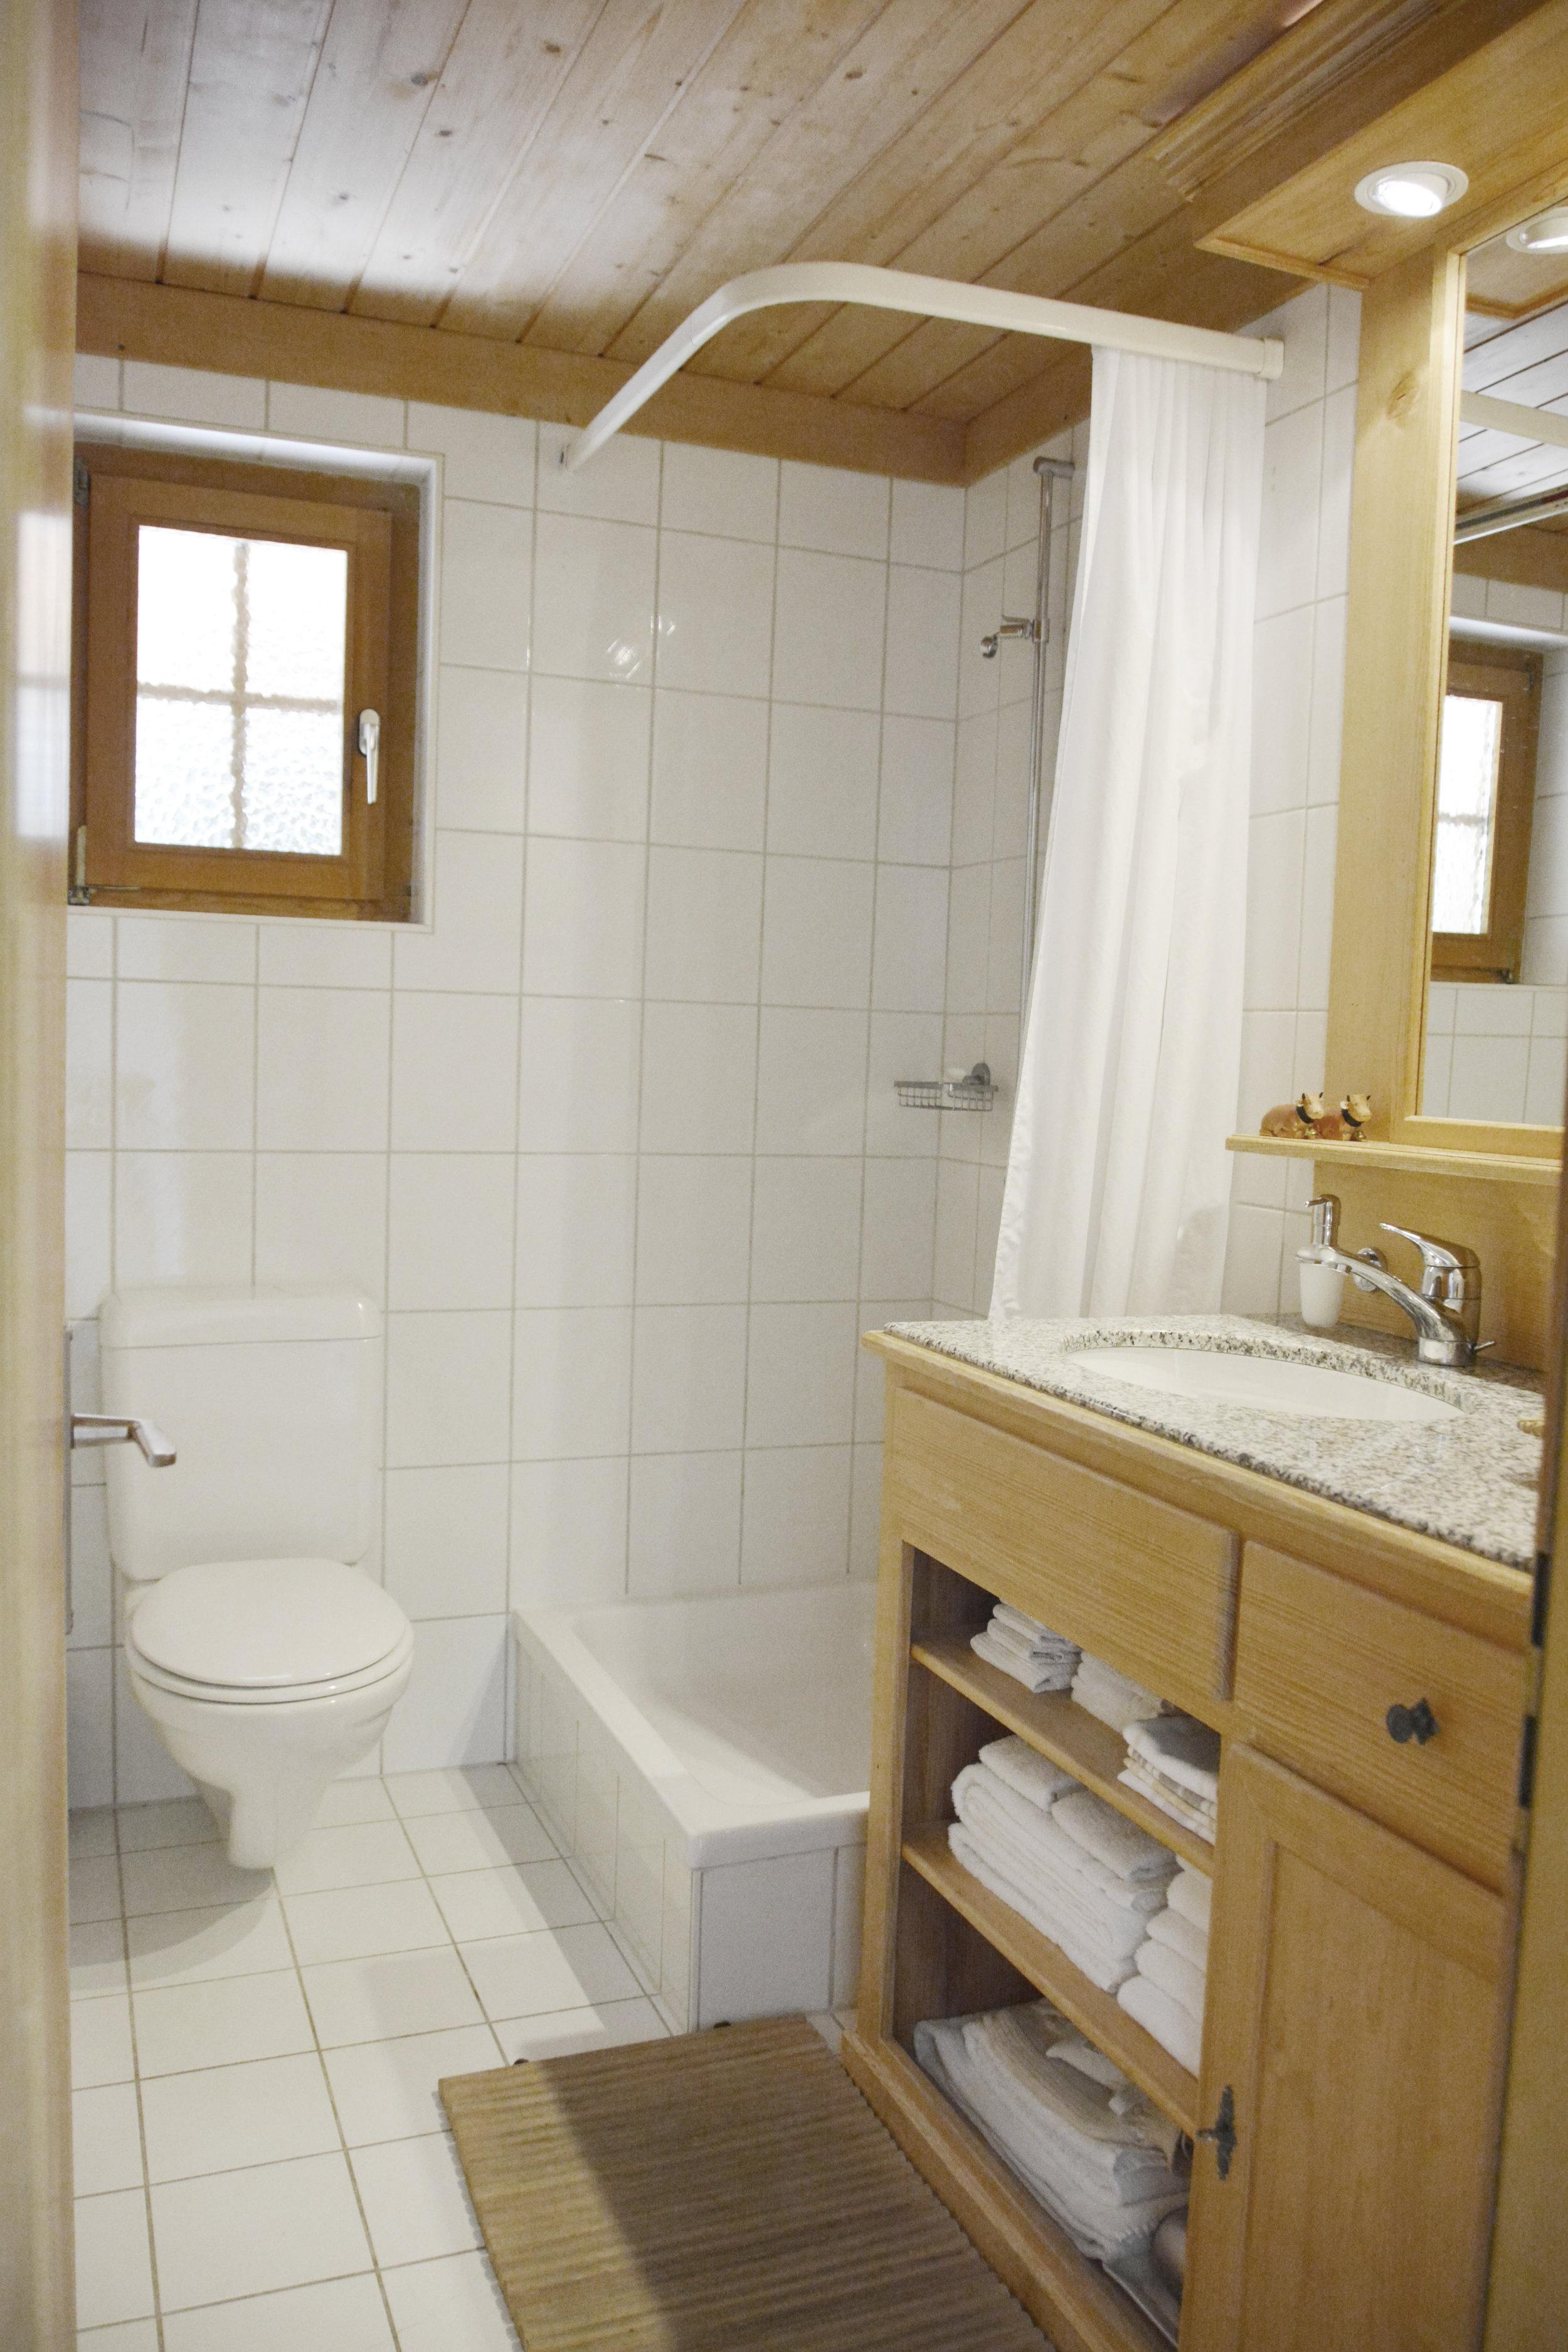 Toilette_Hkern_Nachher_nK.jpg